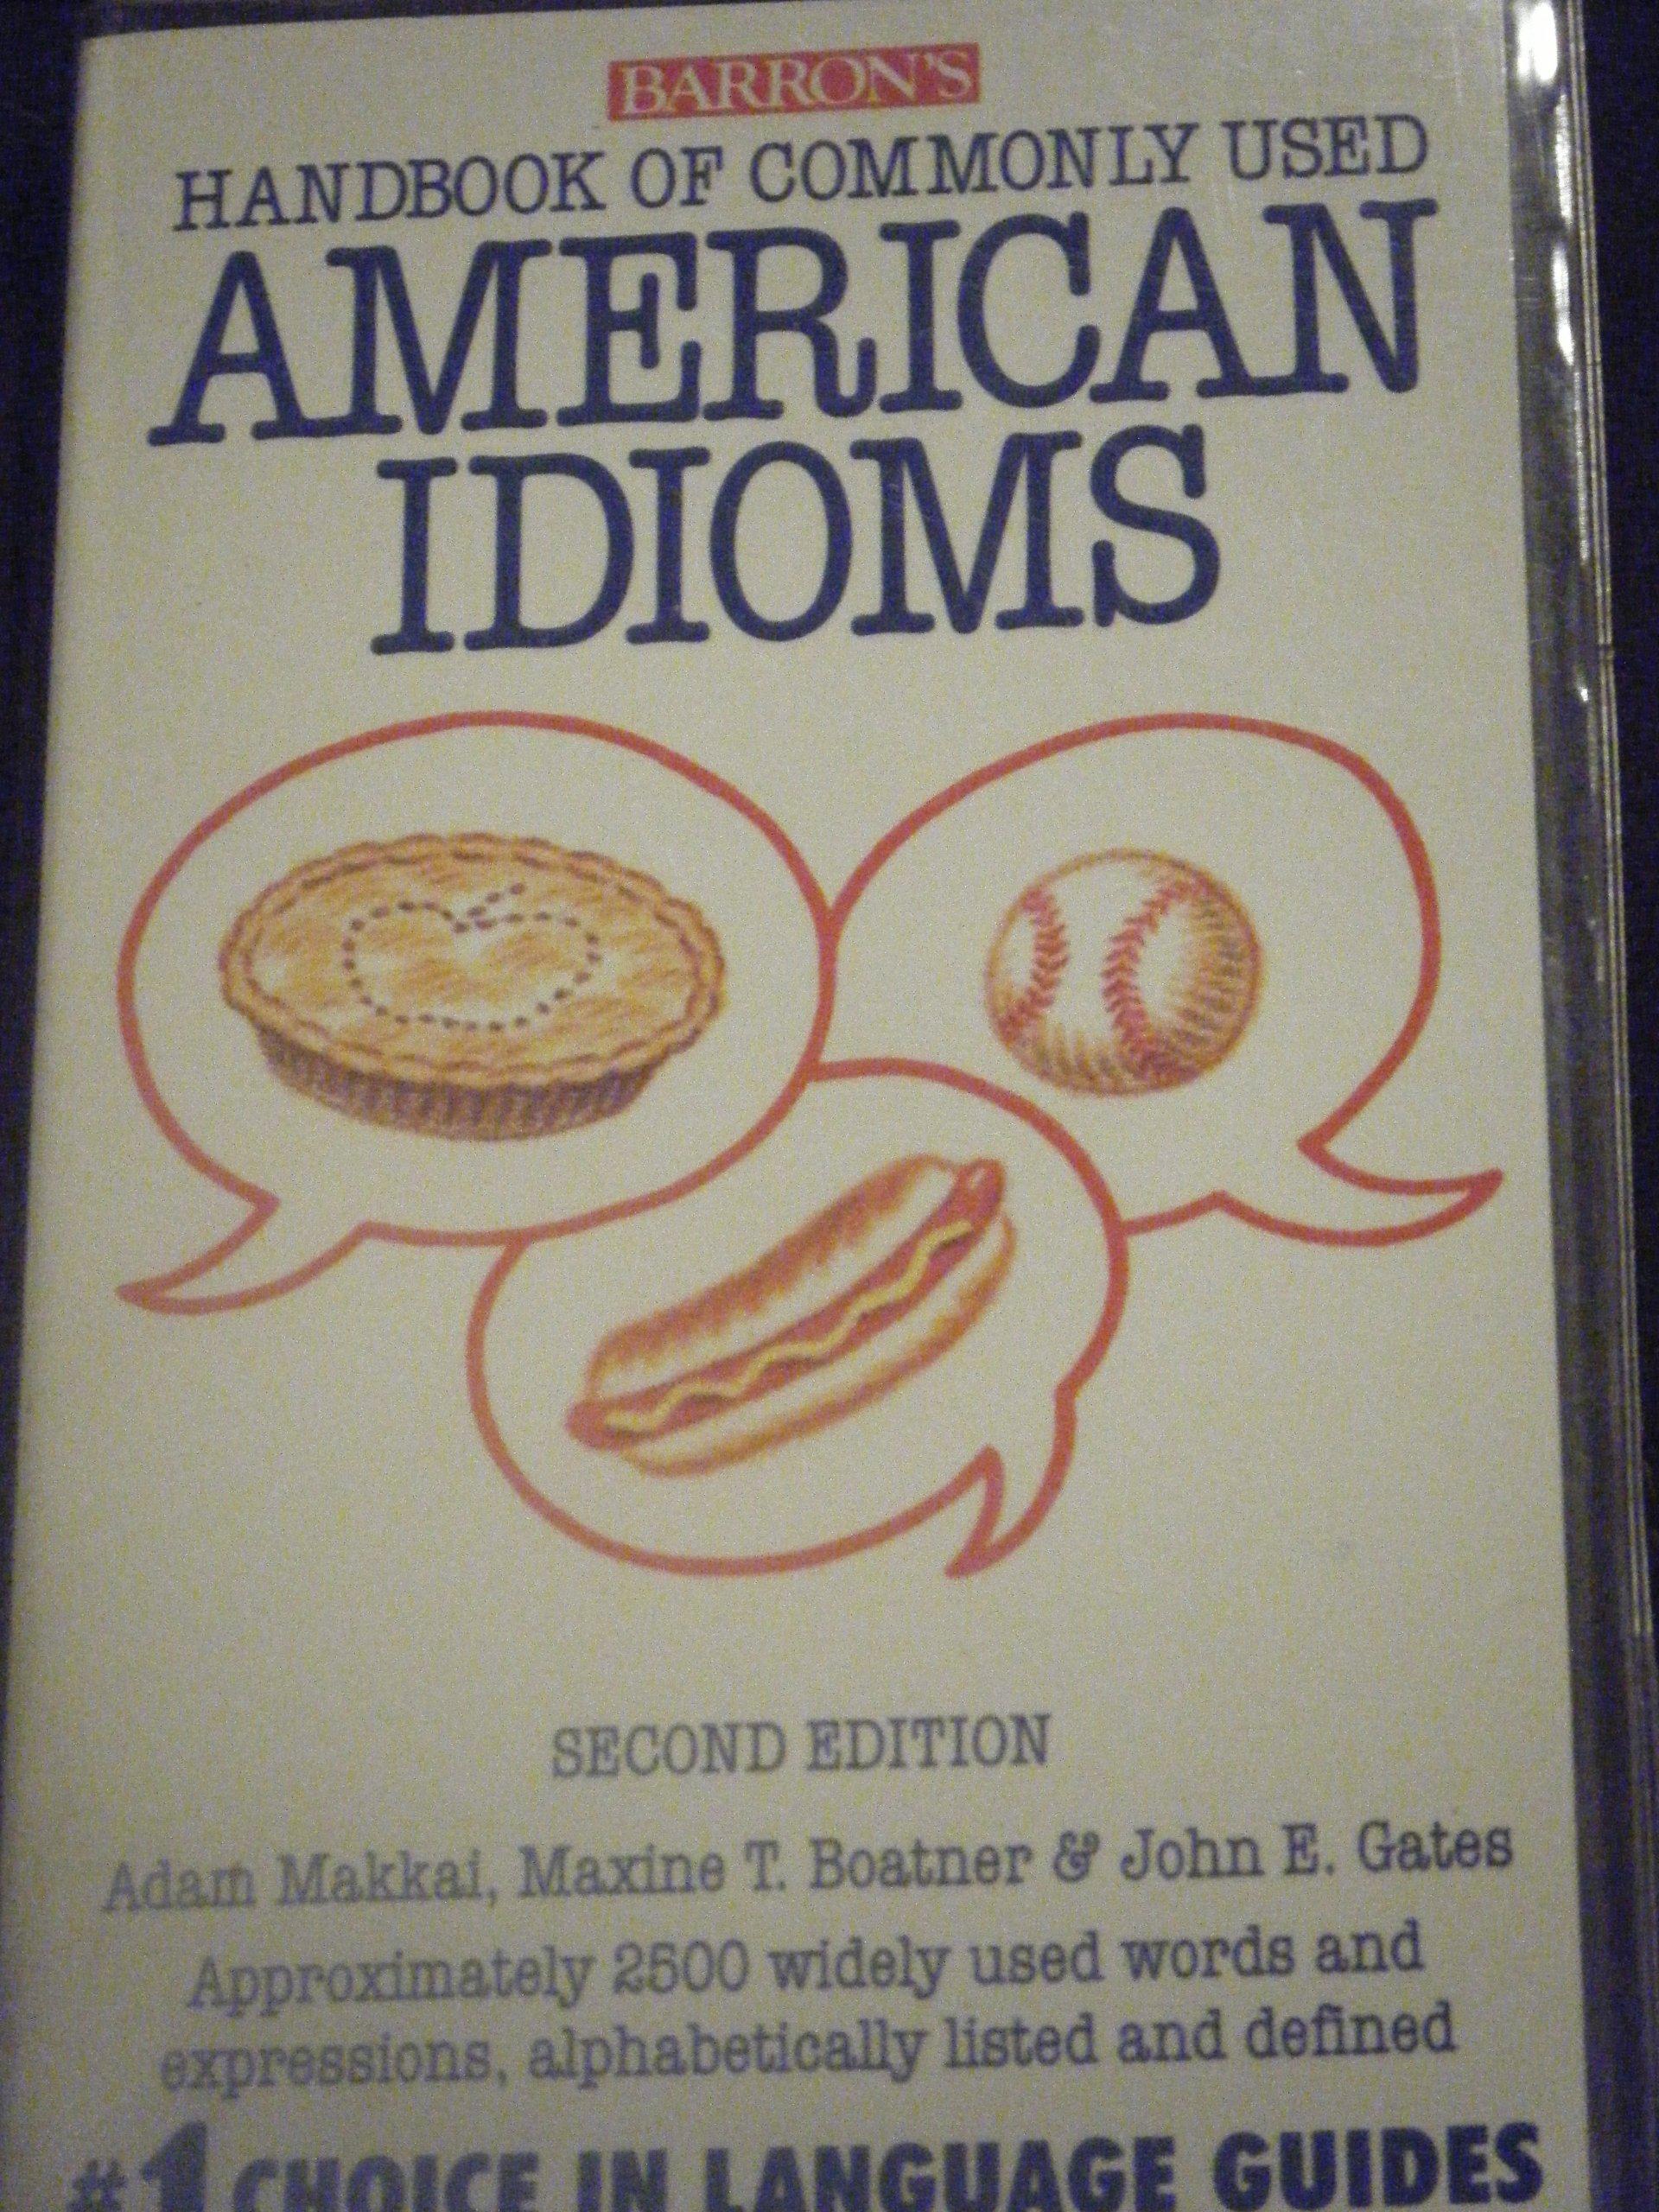 Barron's Handbook of Commonly Used American Idioms: Adam Makkai, Tull  Boatner Maxine, John Gates: 9780812046144: Books - Amazon.ca